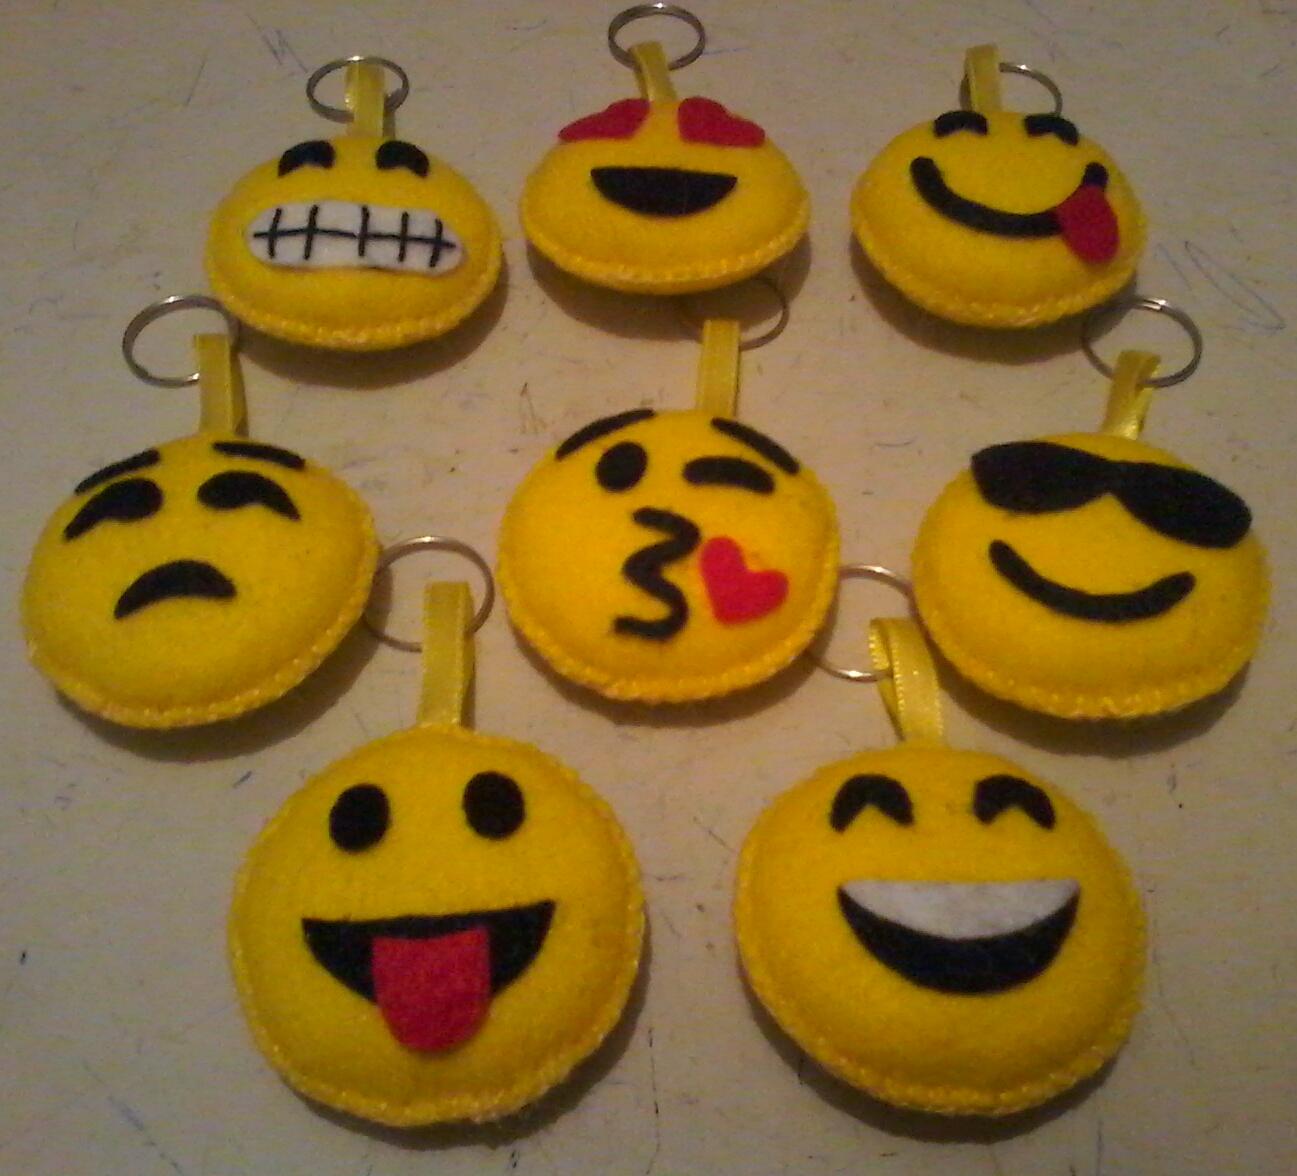 a6bd3a558ff85 Chaveiro Emoji Emoticon Oculos   Elo7